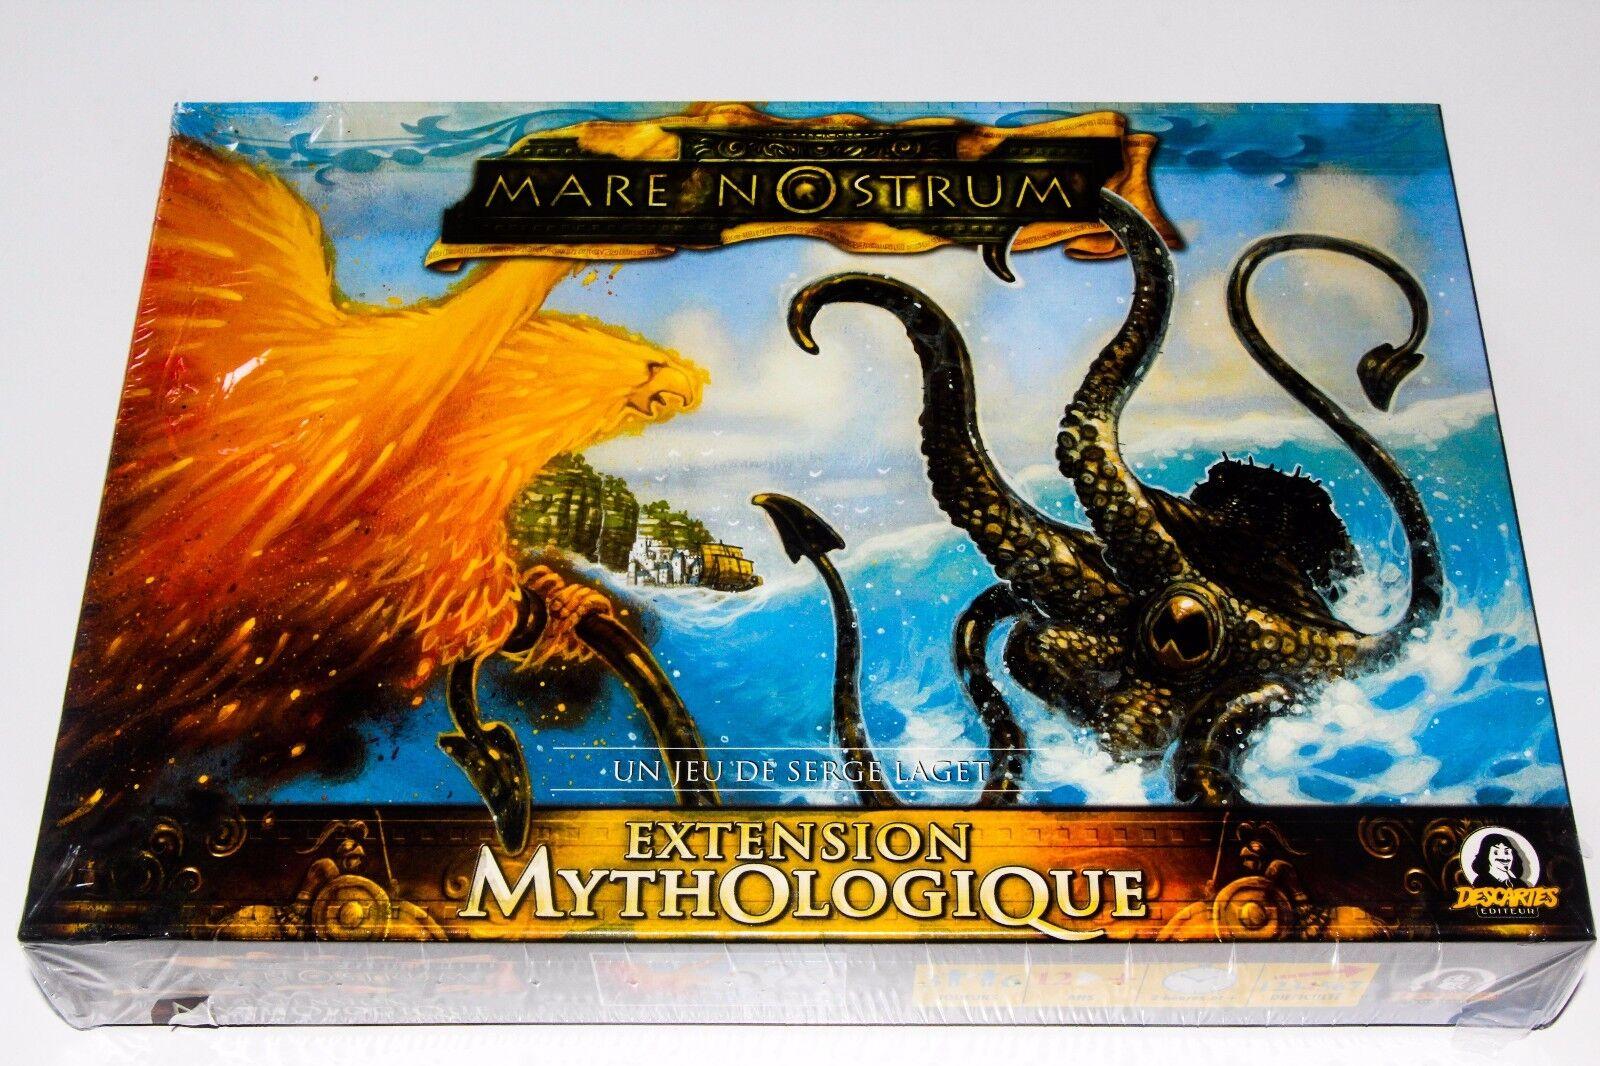 MARE NOSTRUM - EXTENSION MYTHOLOGIQUE - RARE - - -  DESCARTES - NEUF   NEW - BLISTER 1f1b39